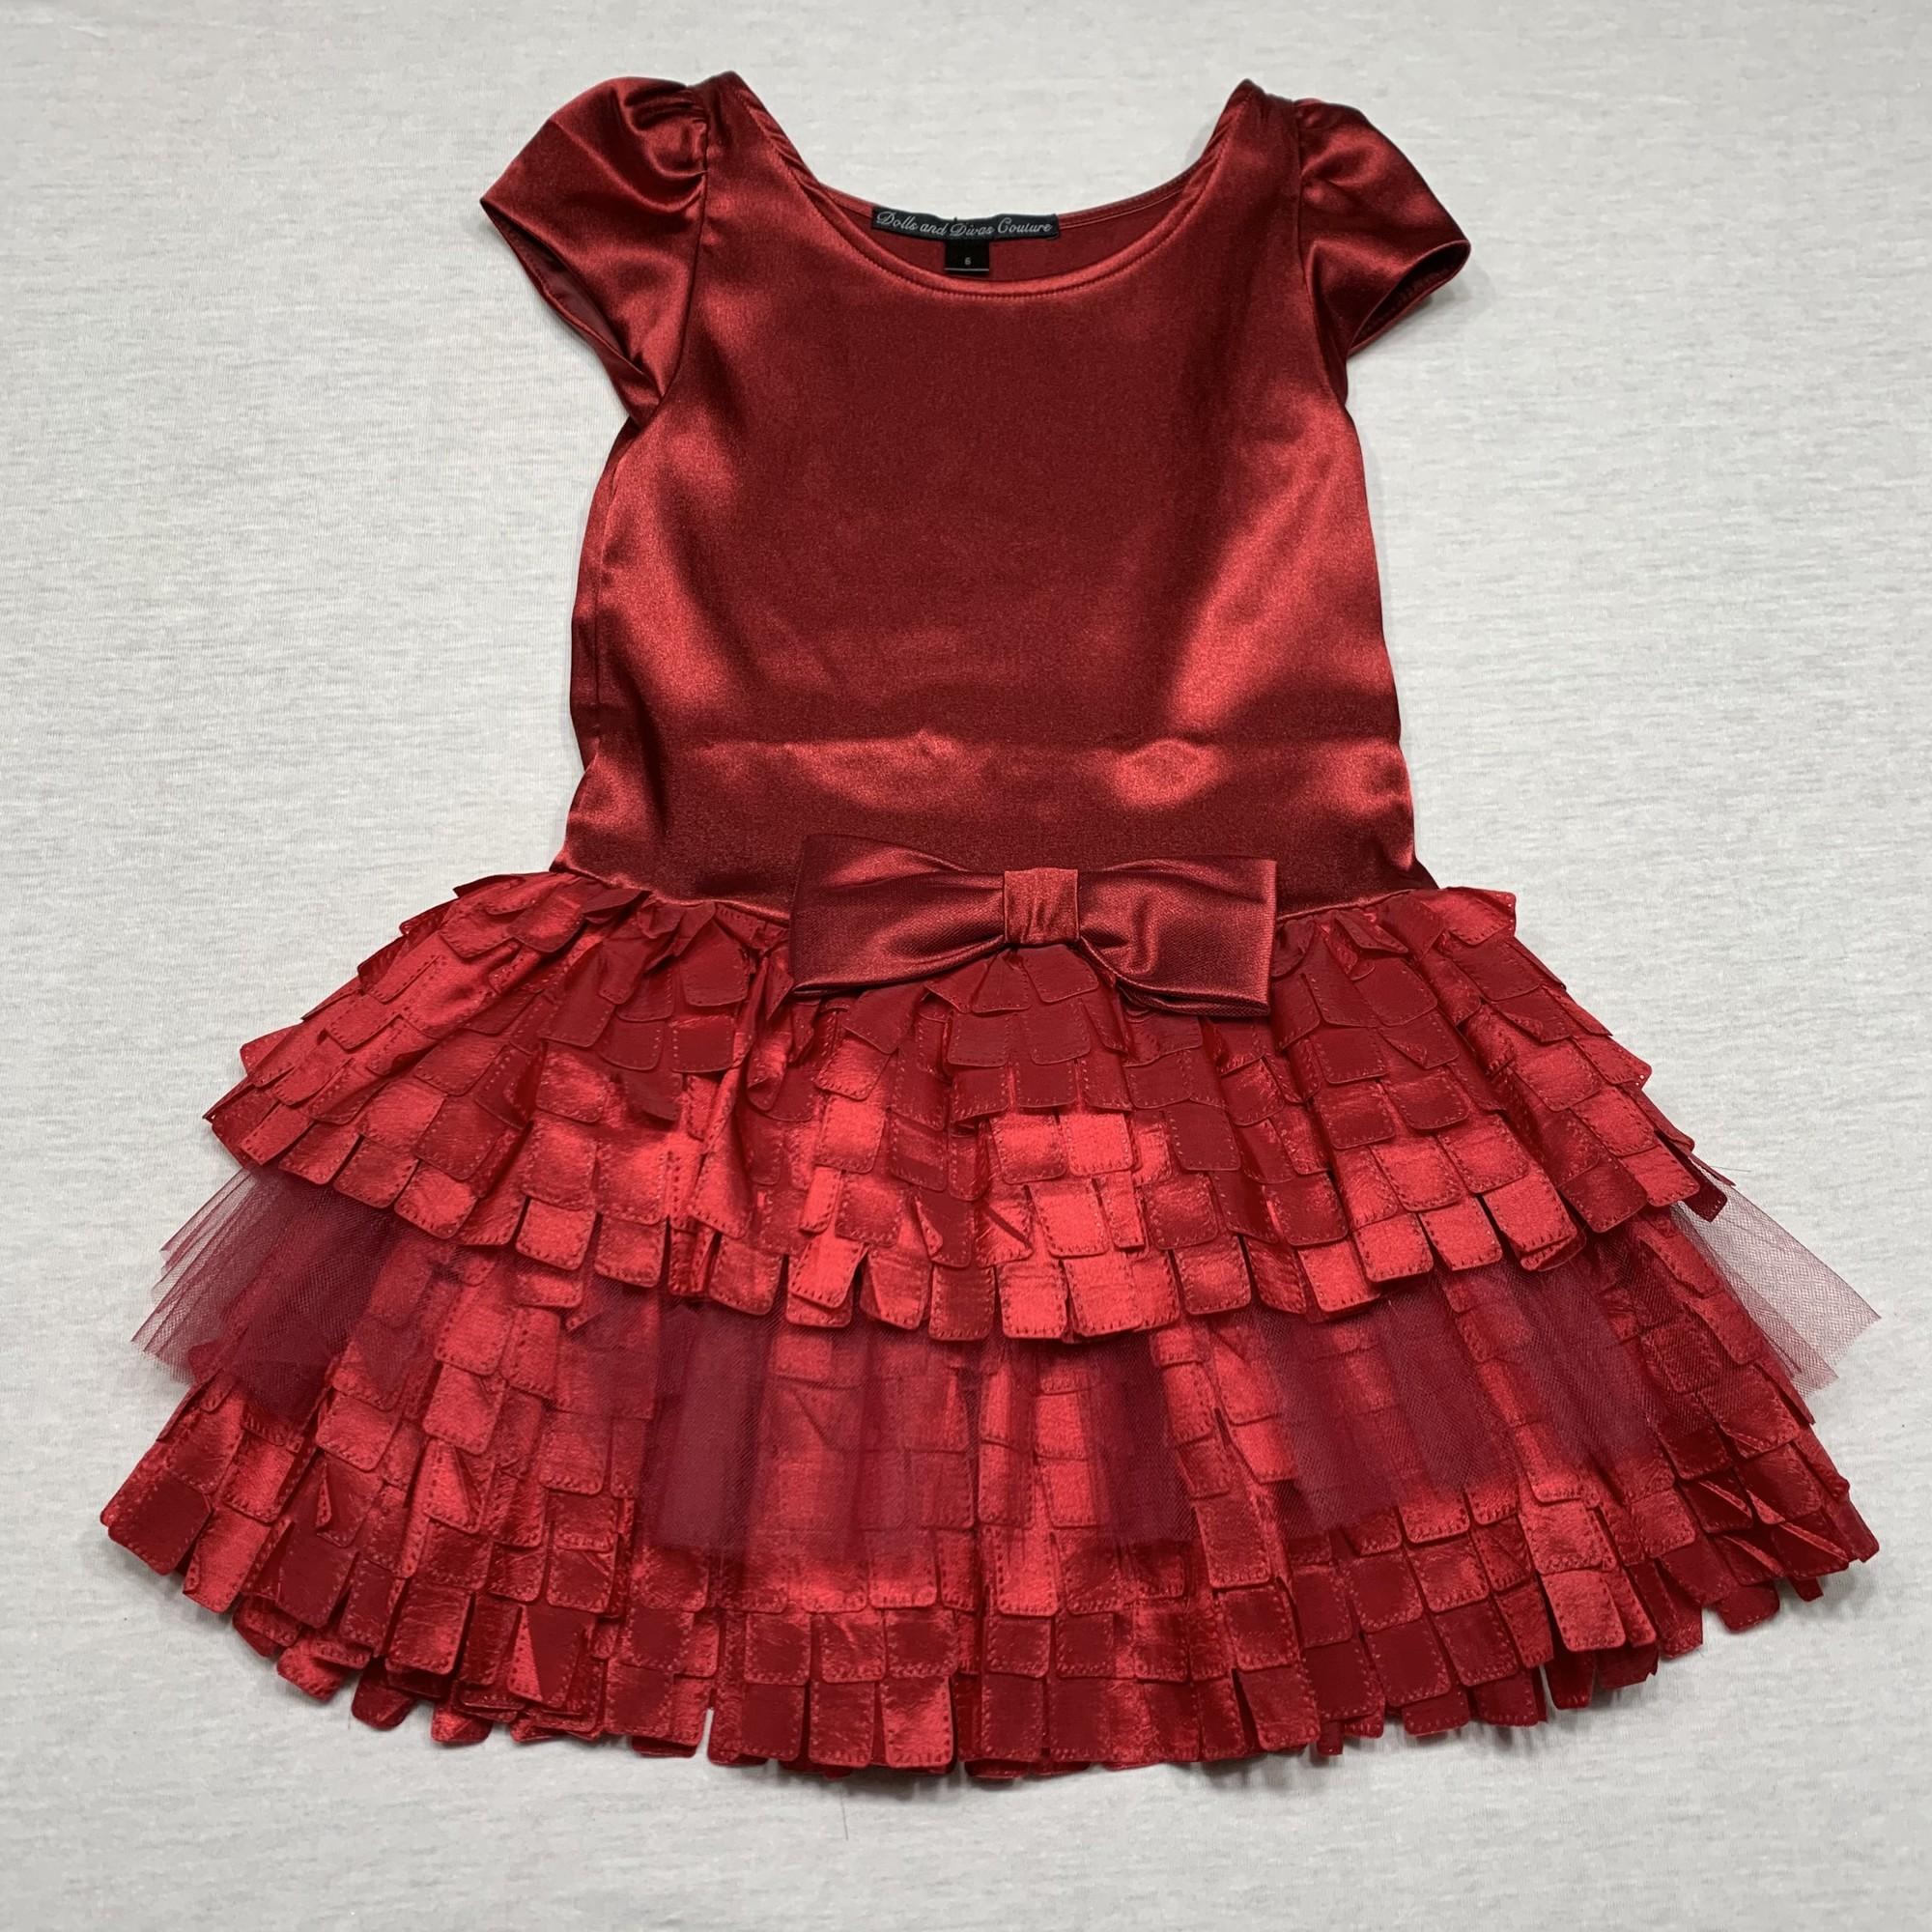 Dress with satin bodice & layered satin/tulle skirt